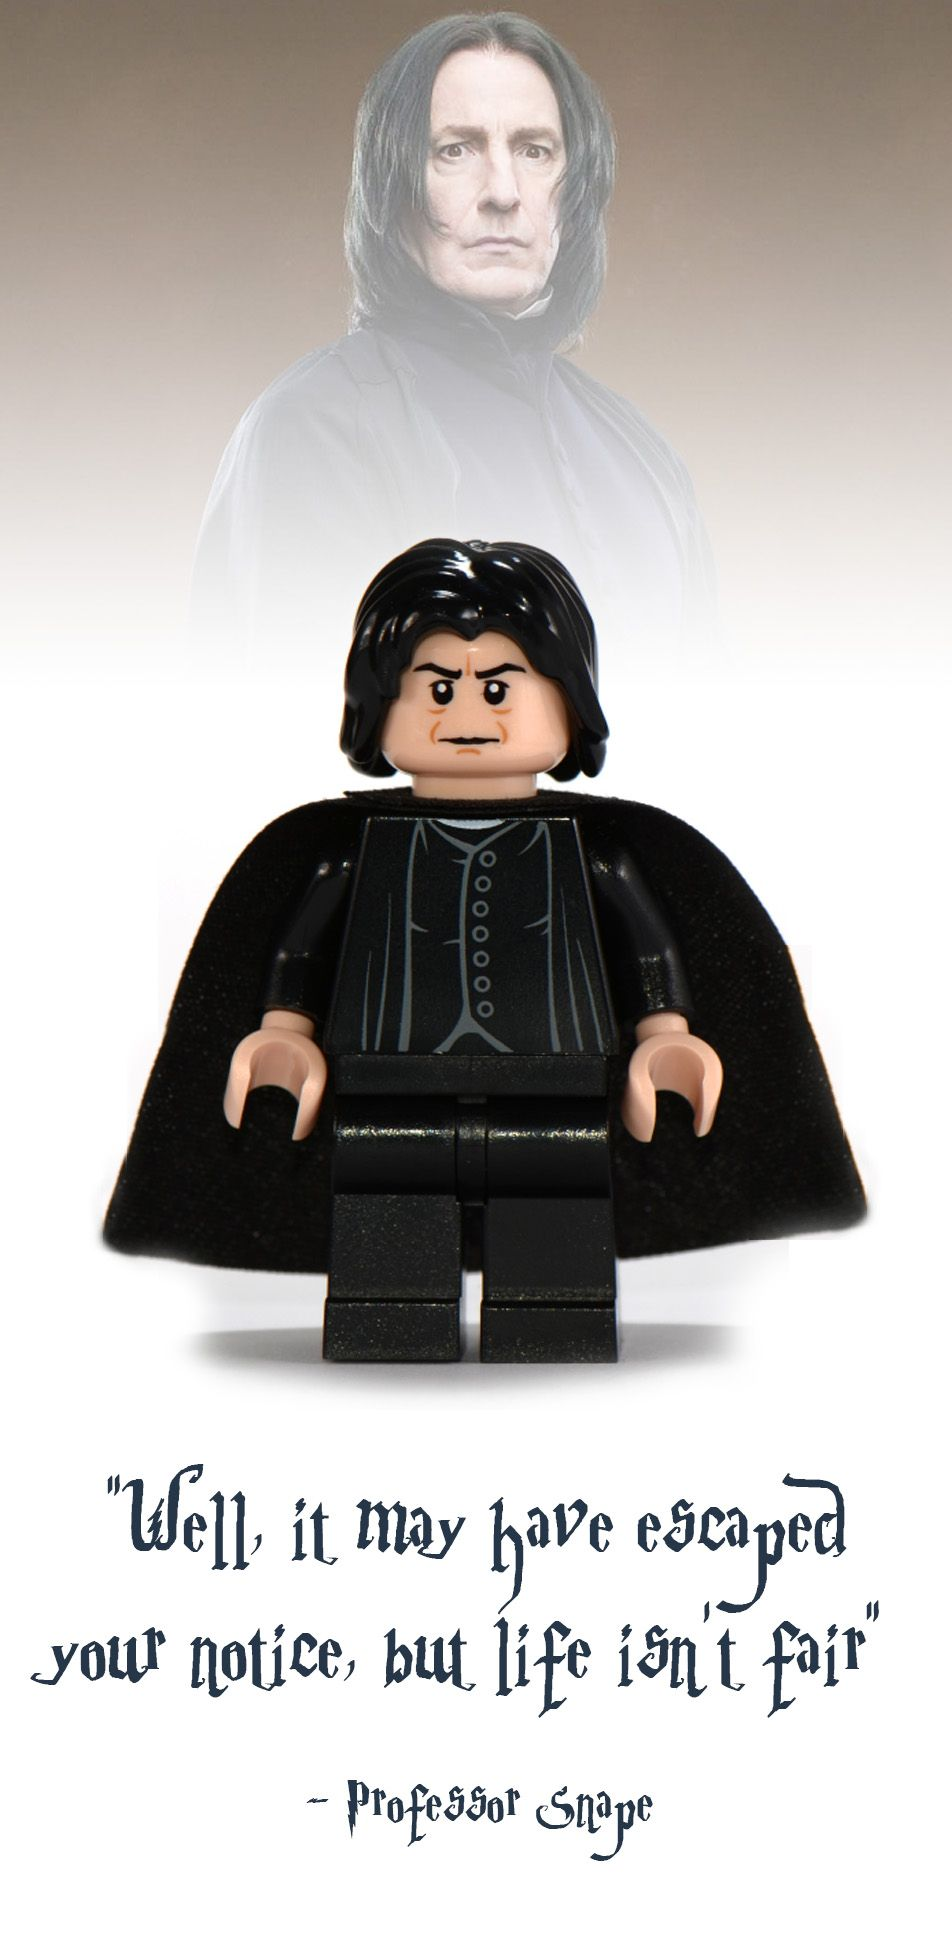 ef013898b Professor Snape Lego Minifigure - Harry Potter Collectibles Harry Potter  Severus Snape